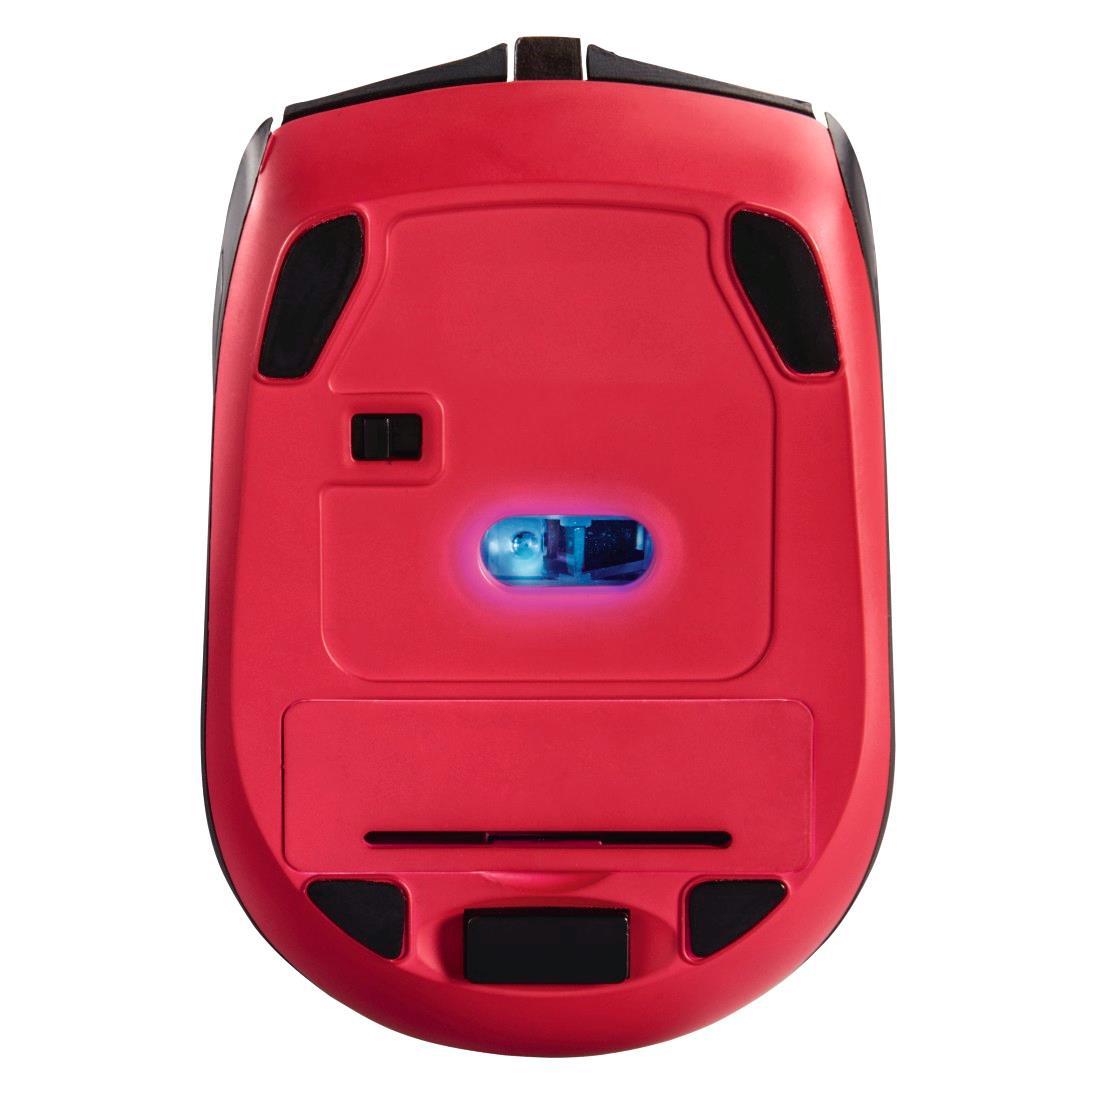 fd2927576c9 Hama Milano Mouse Optical Wireless Black Ref 53942 | Elite Office